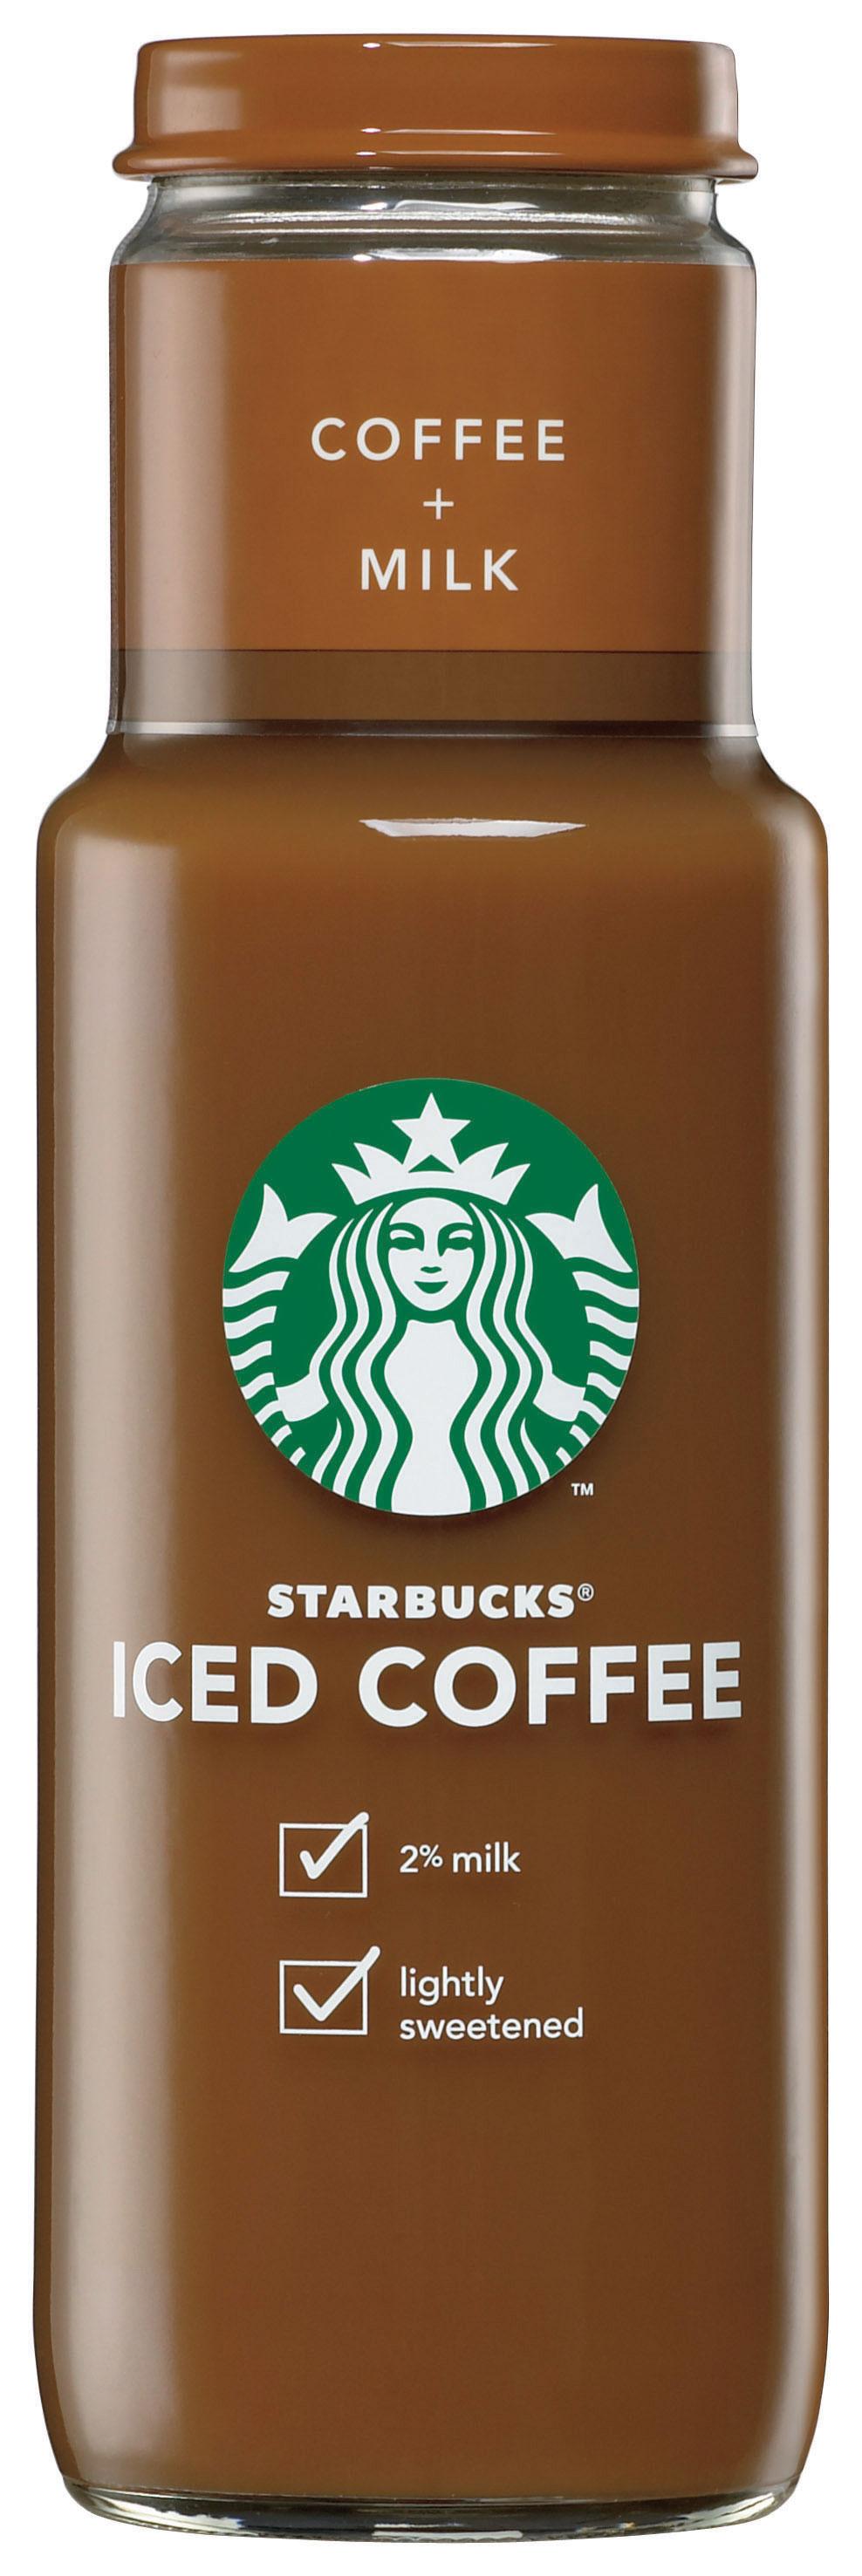 starbucks-icedcoffee